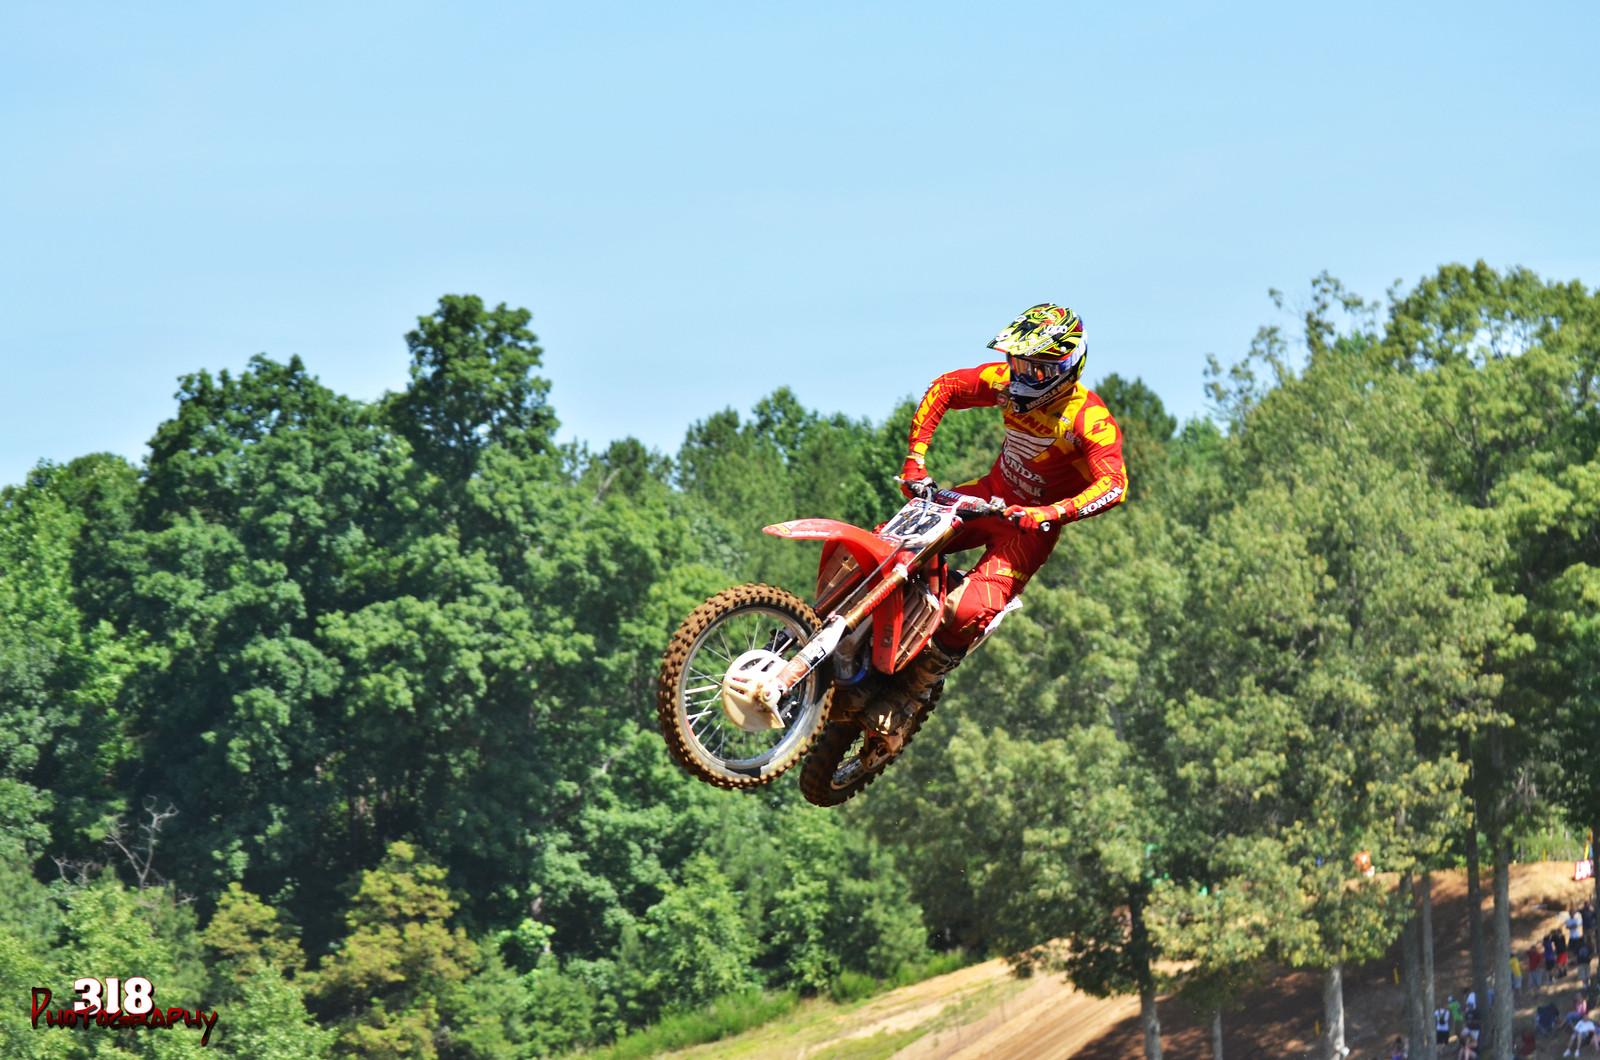 10-02 - MxPro318 - Motocross Pictures - Vital MX